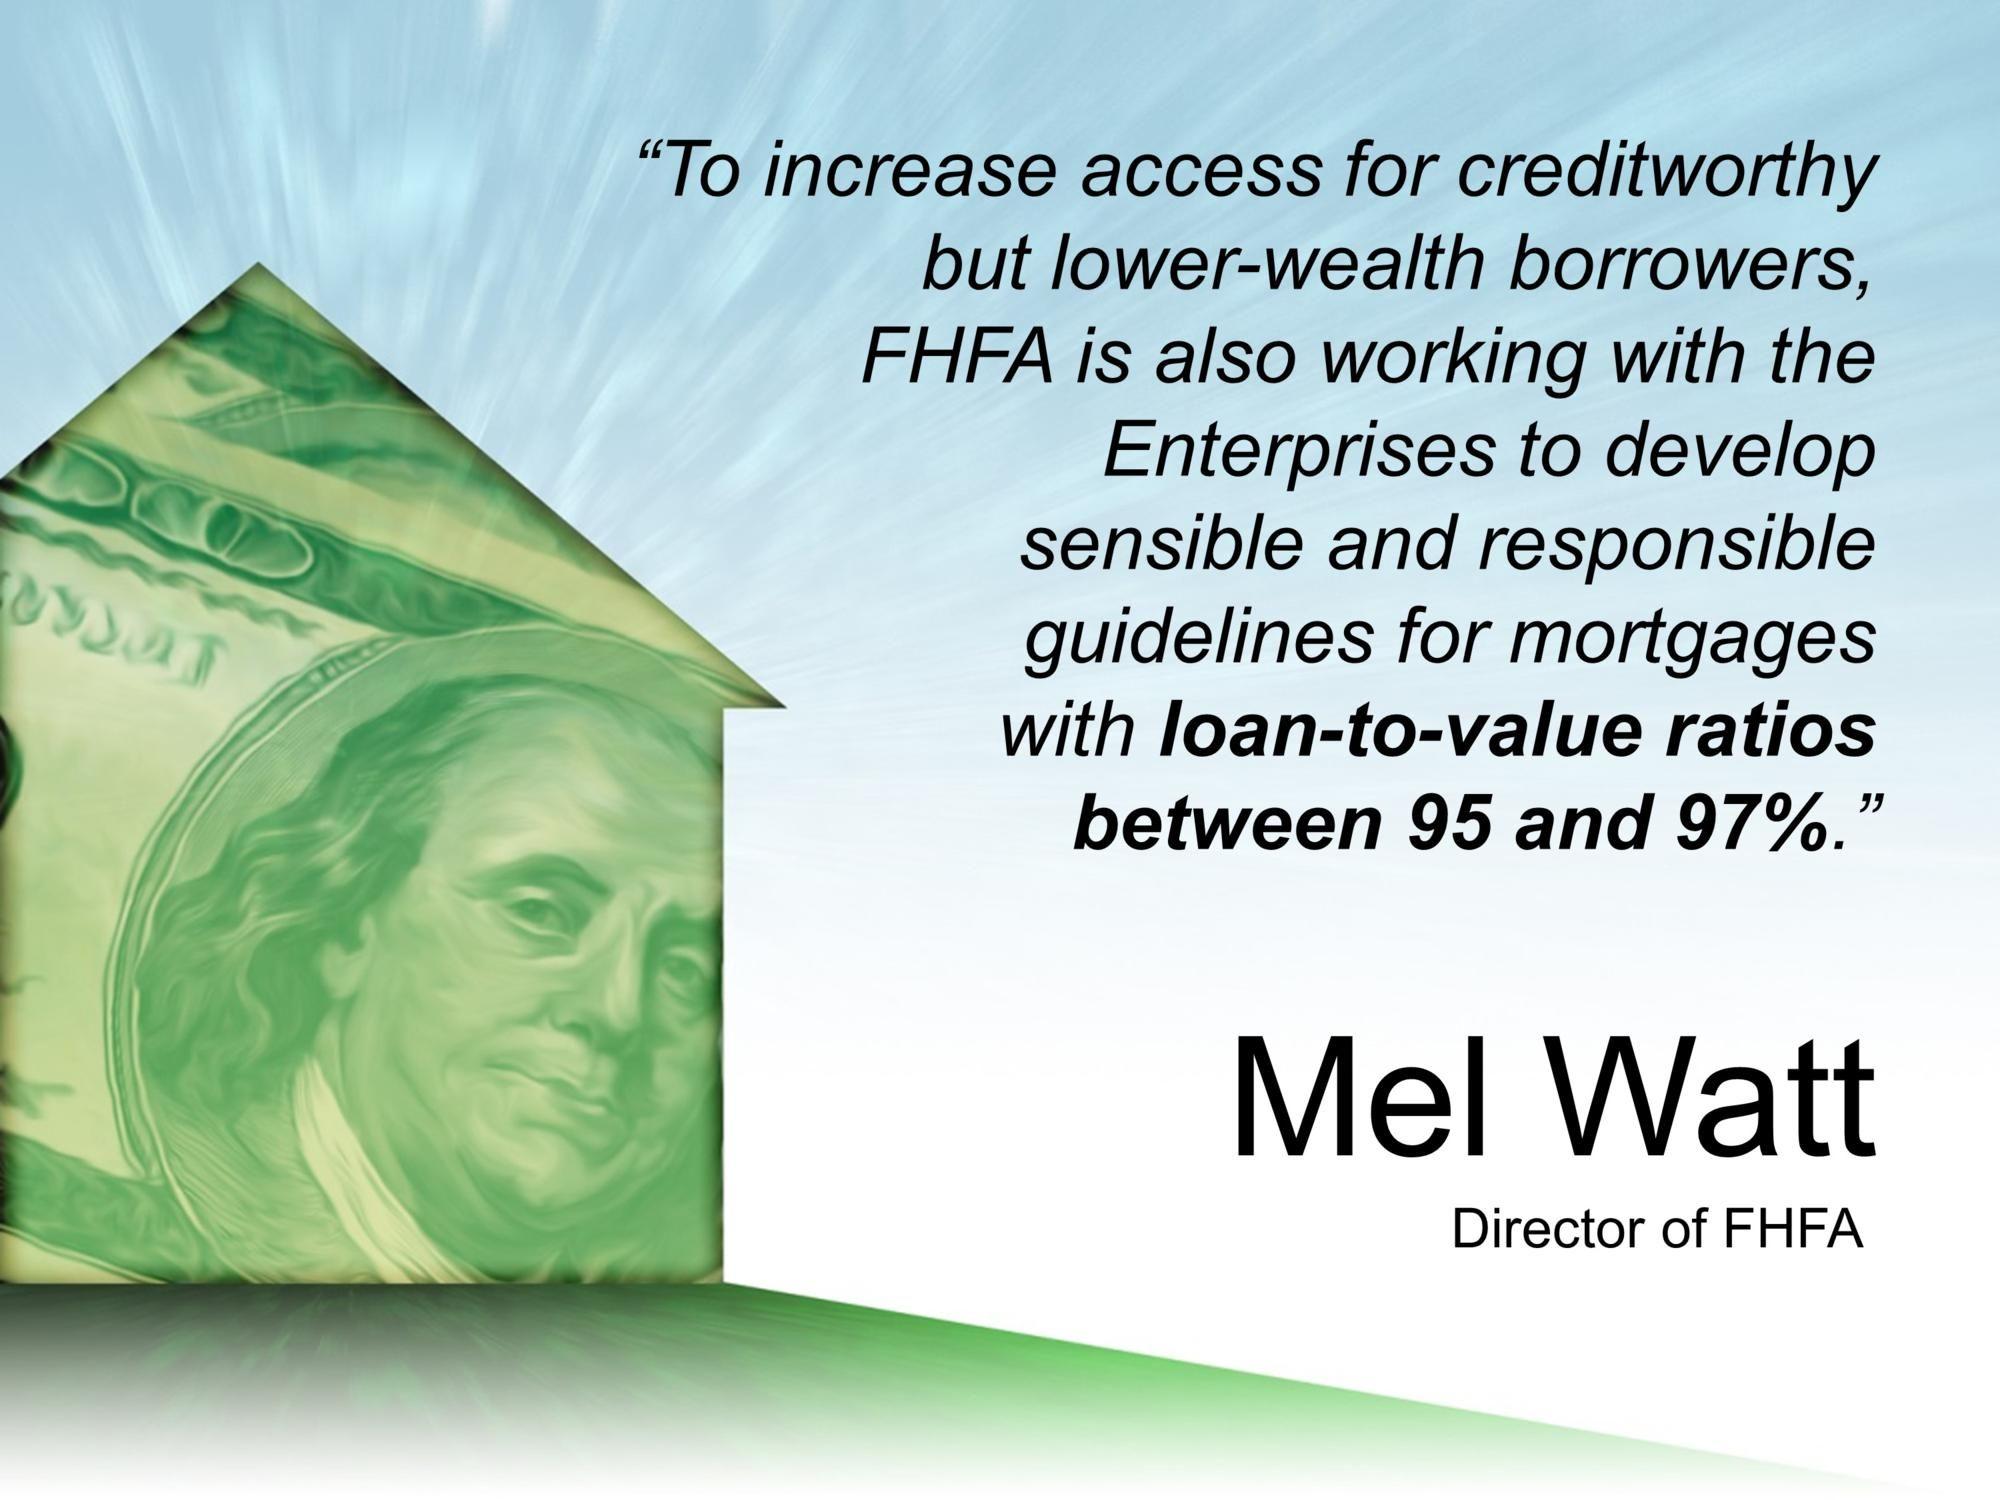 FHFA Loan to value ratios The borrowers, Home mortgage